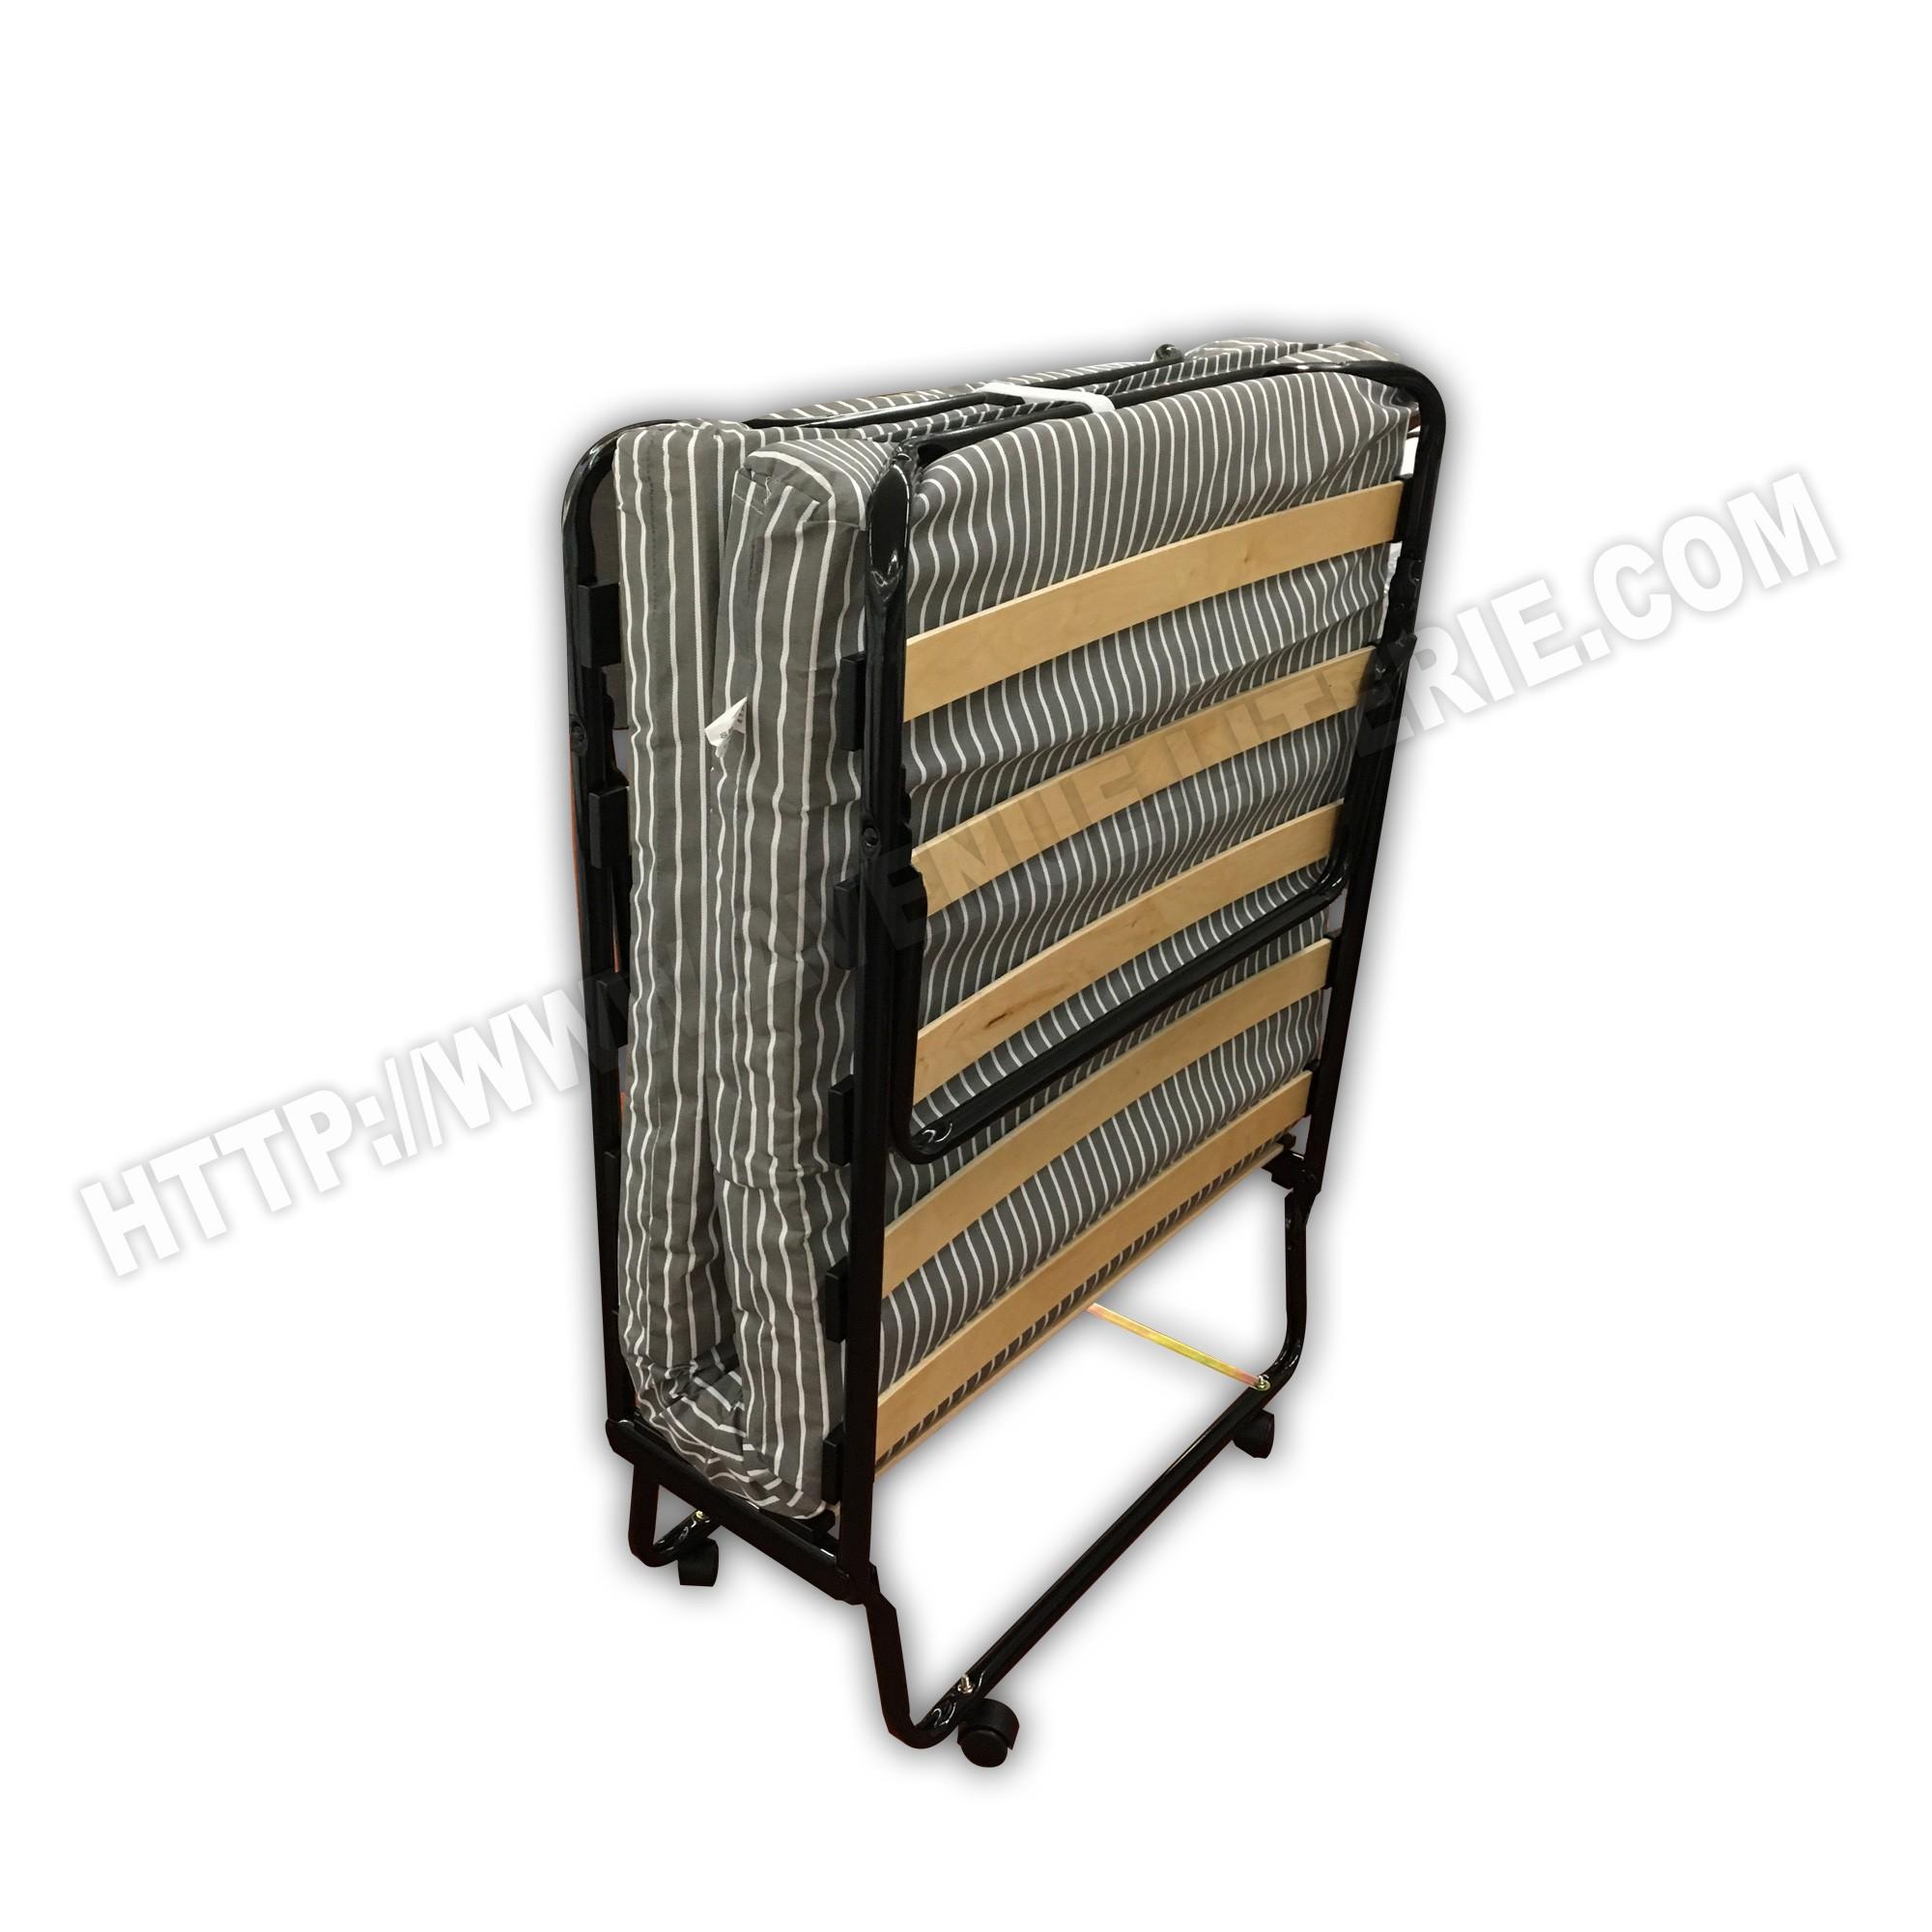 lit pliant d 39 appoint personne. Black Bedroom Furniture Sets. Home Design Ideas